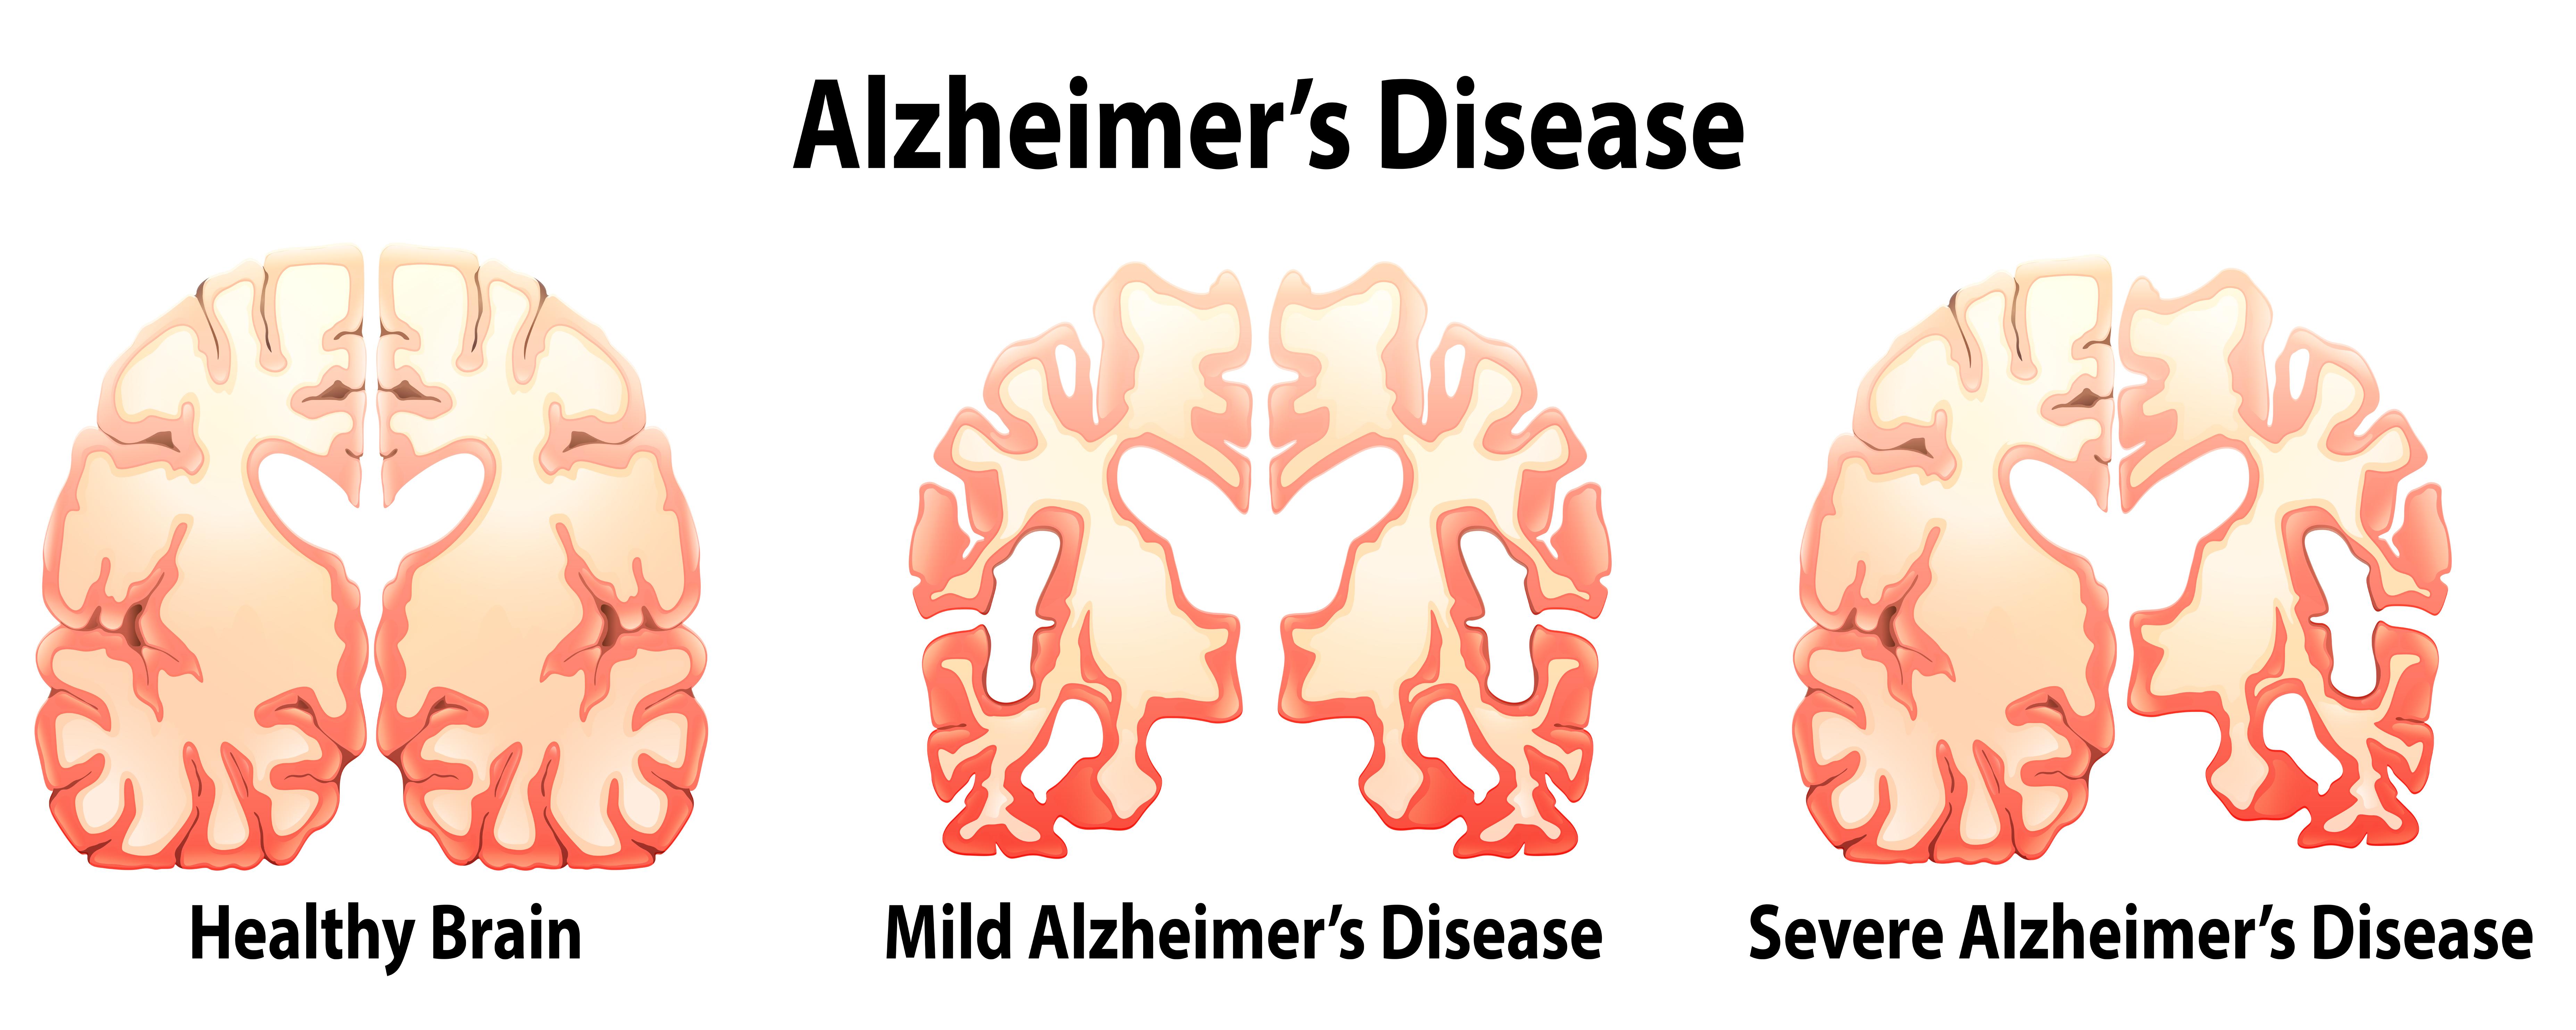 Illustration of Alzheimer's Disease | Stock image St. George News